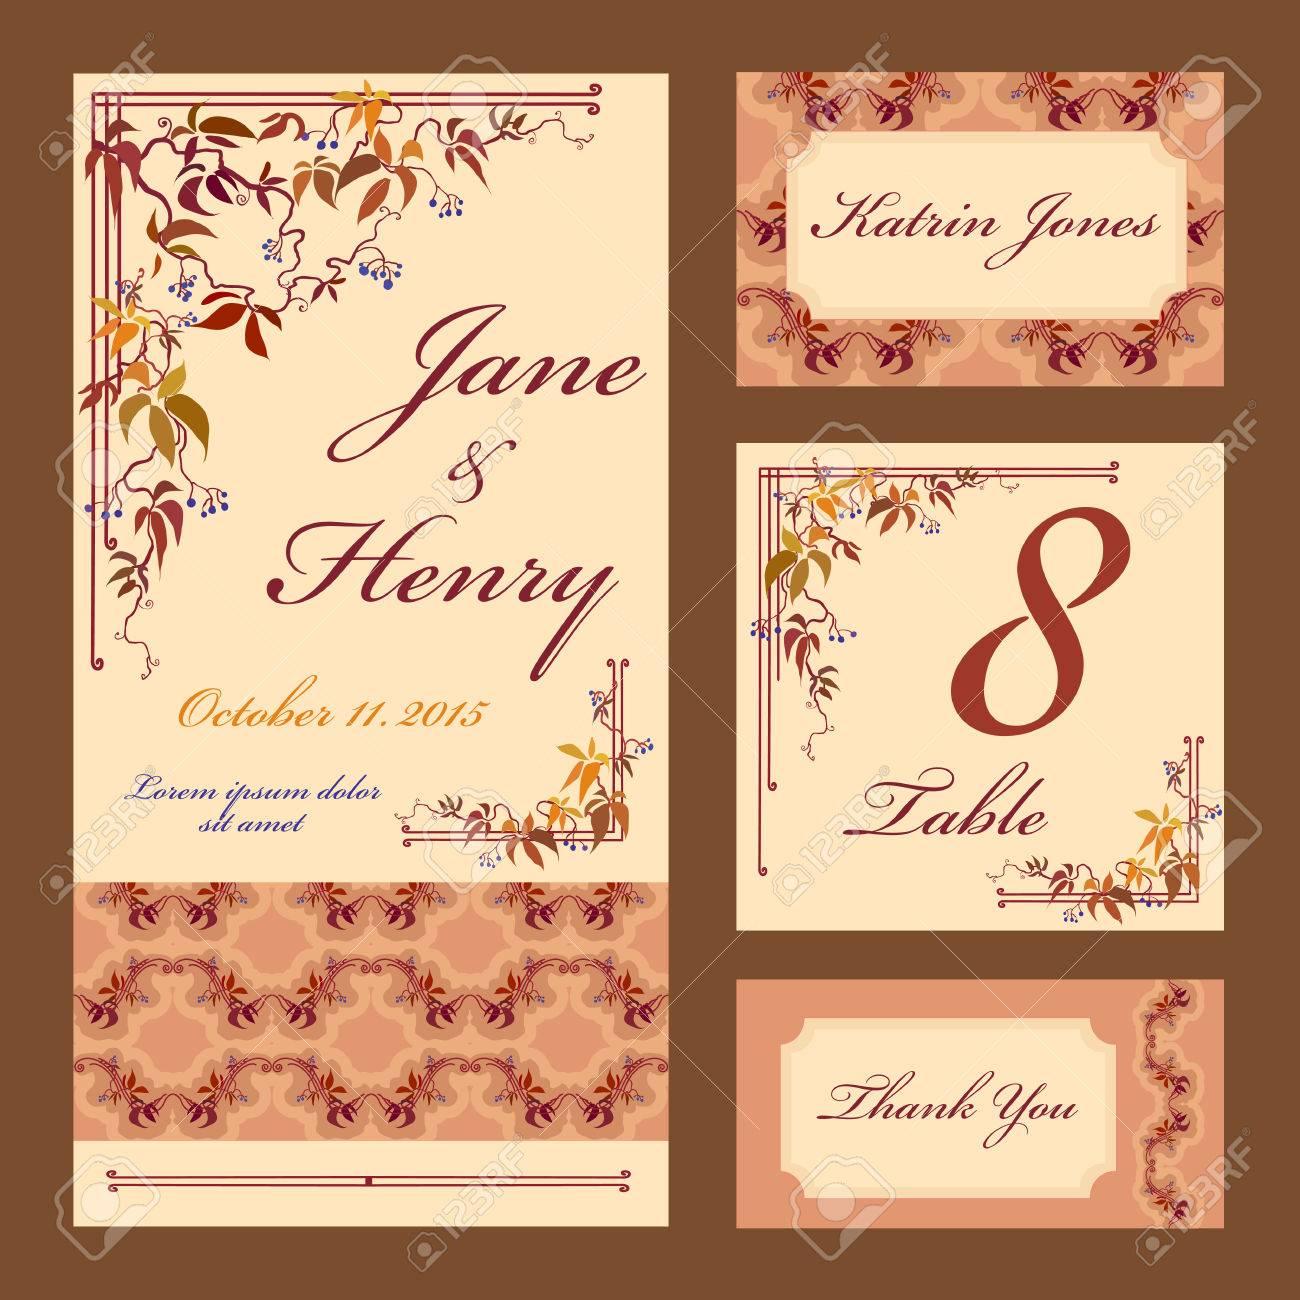 Set Printable Backgrounds To Celebrate The Wedding Invitation